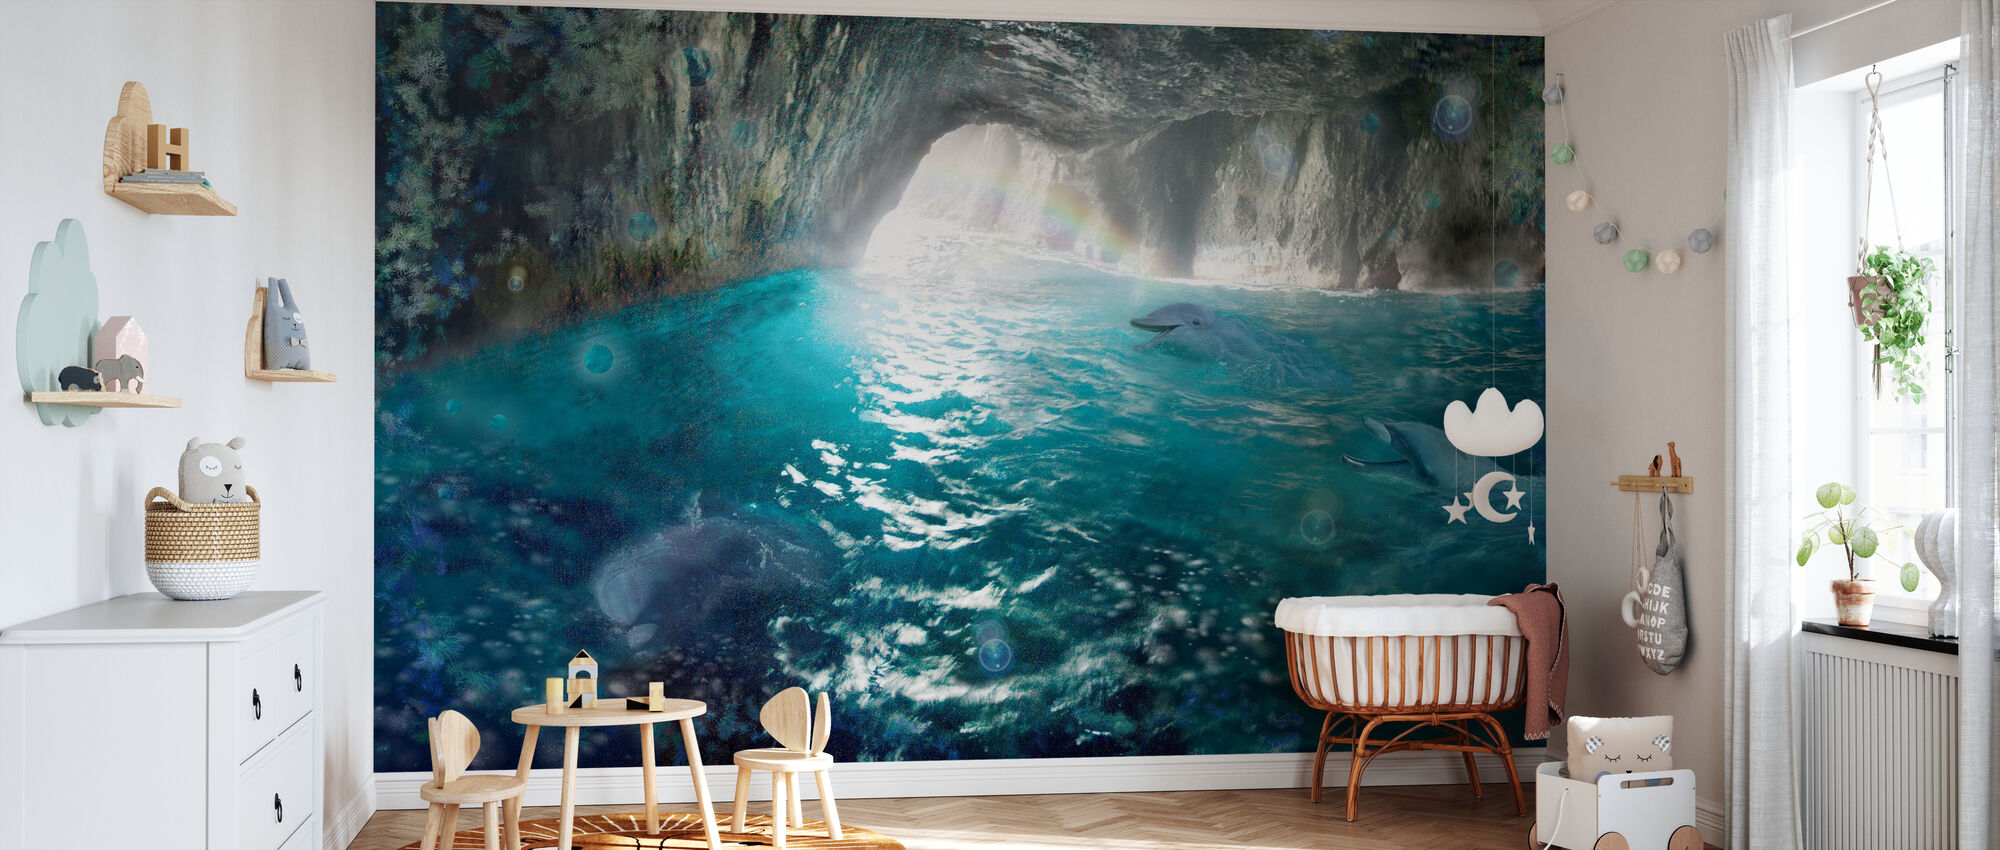 Dolphin Seacave - Wallpaper - Nursery